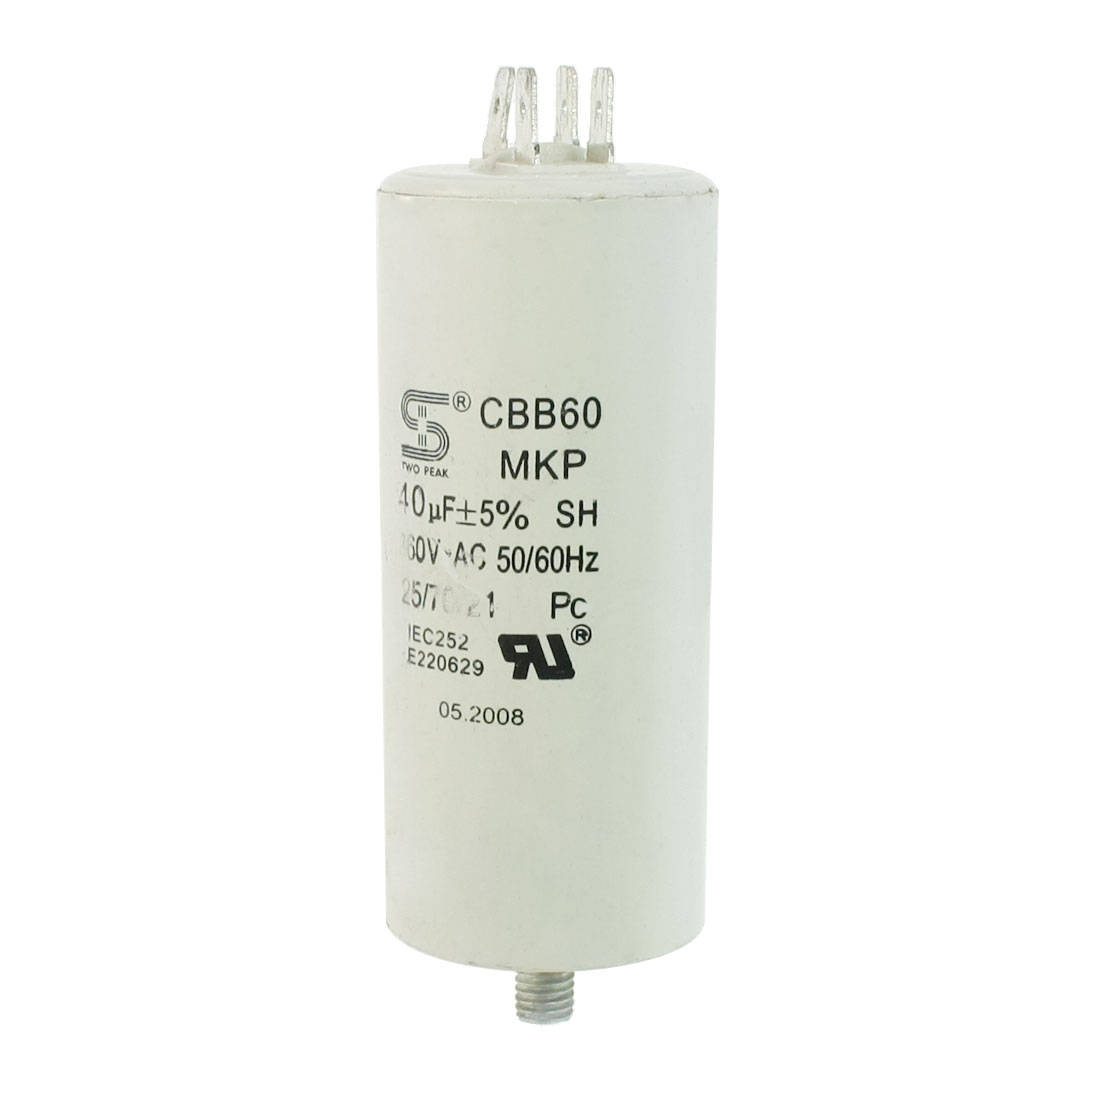 8mm Male Thread Washing Machine Polypropylene Film Capacitor CBB60 5% 40uF AC260V